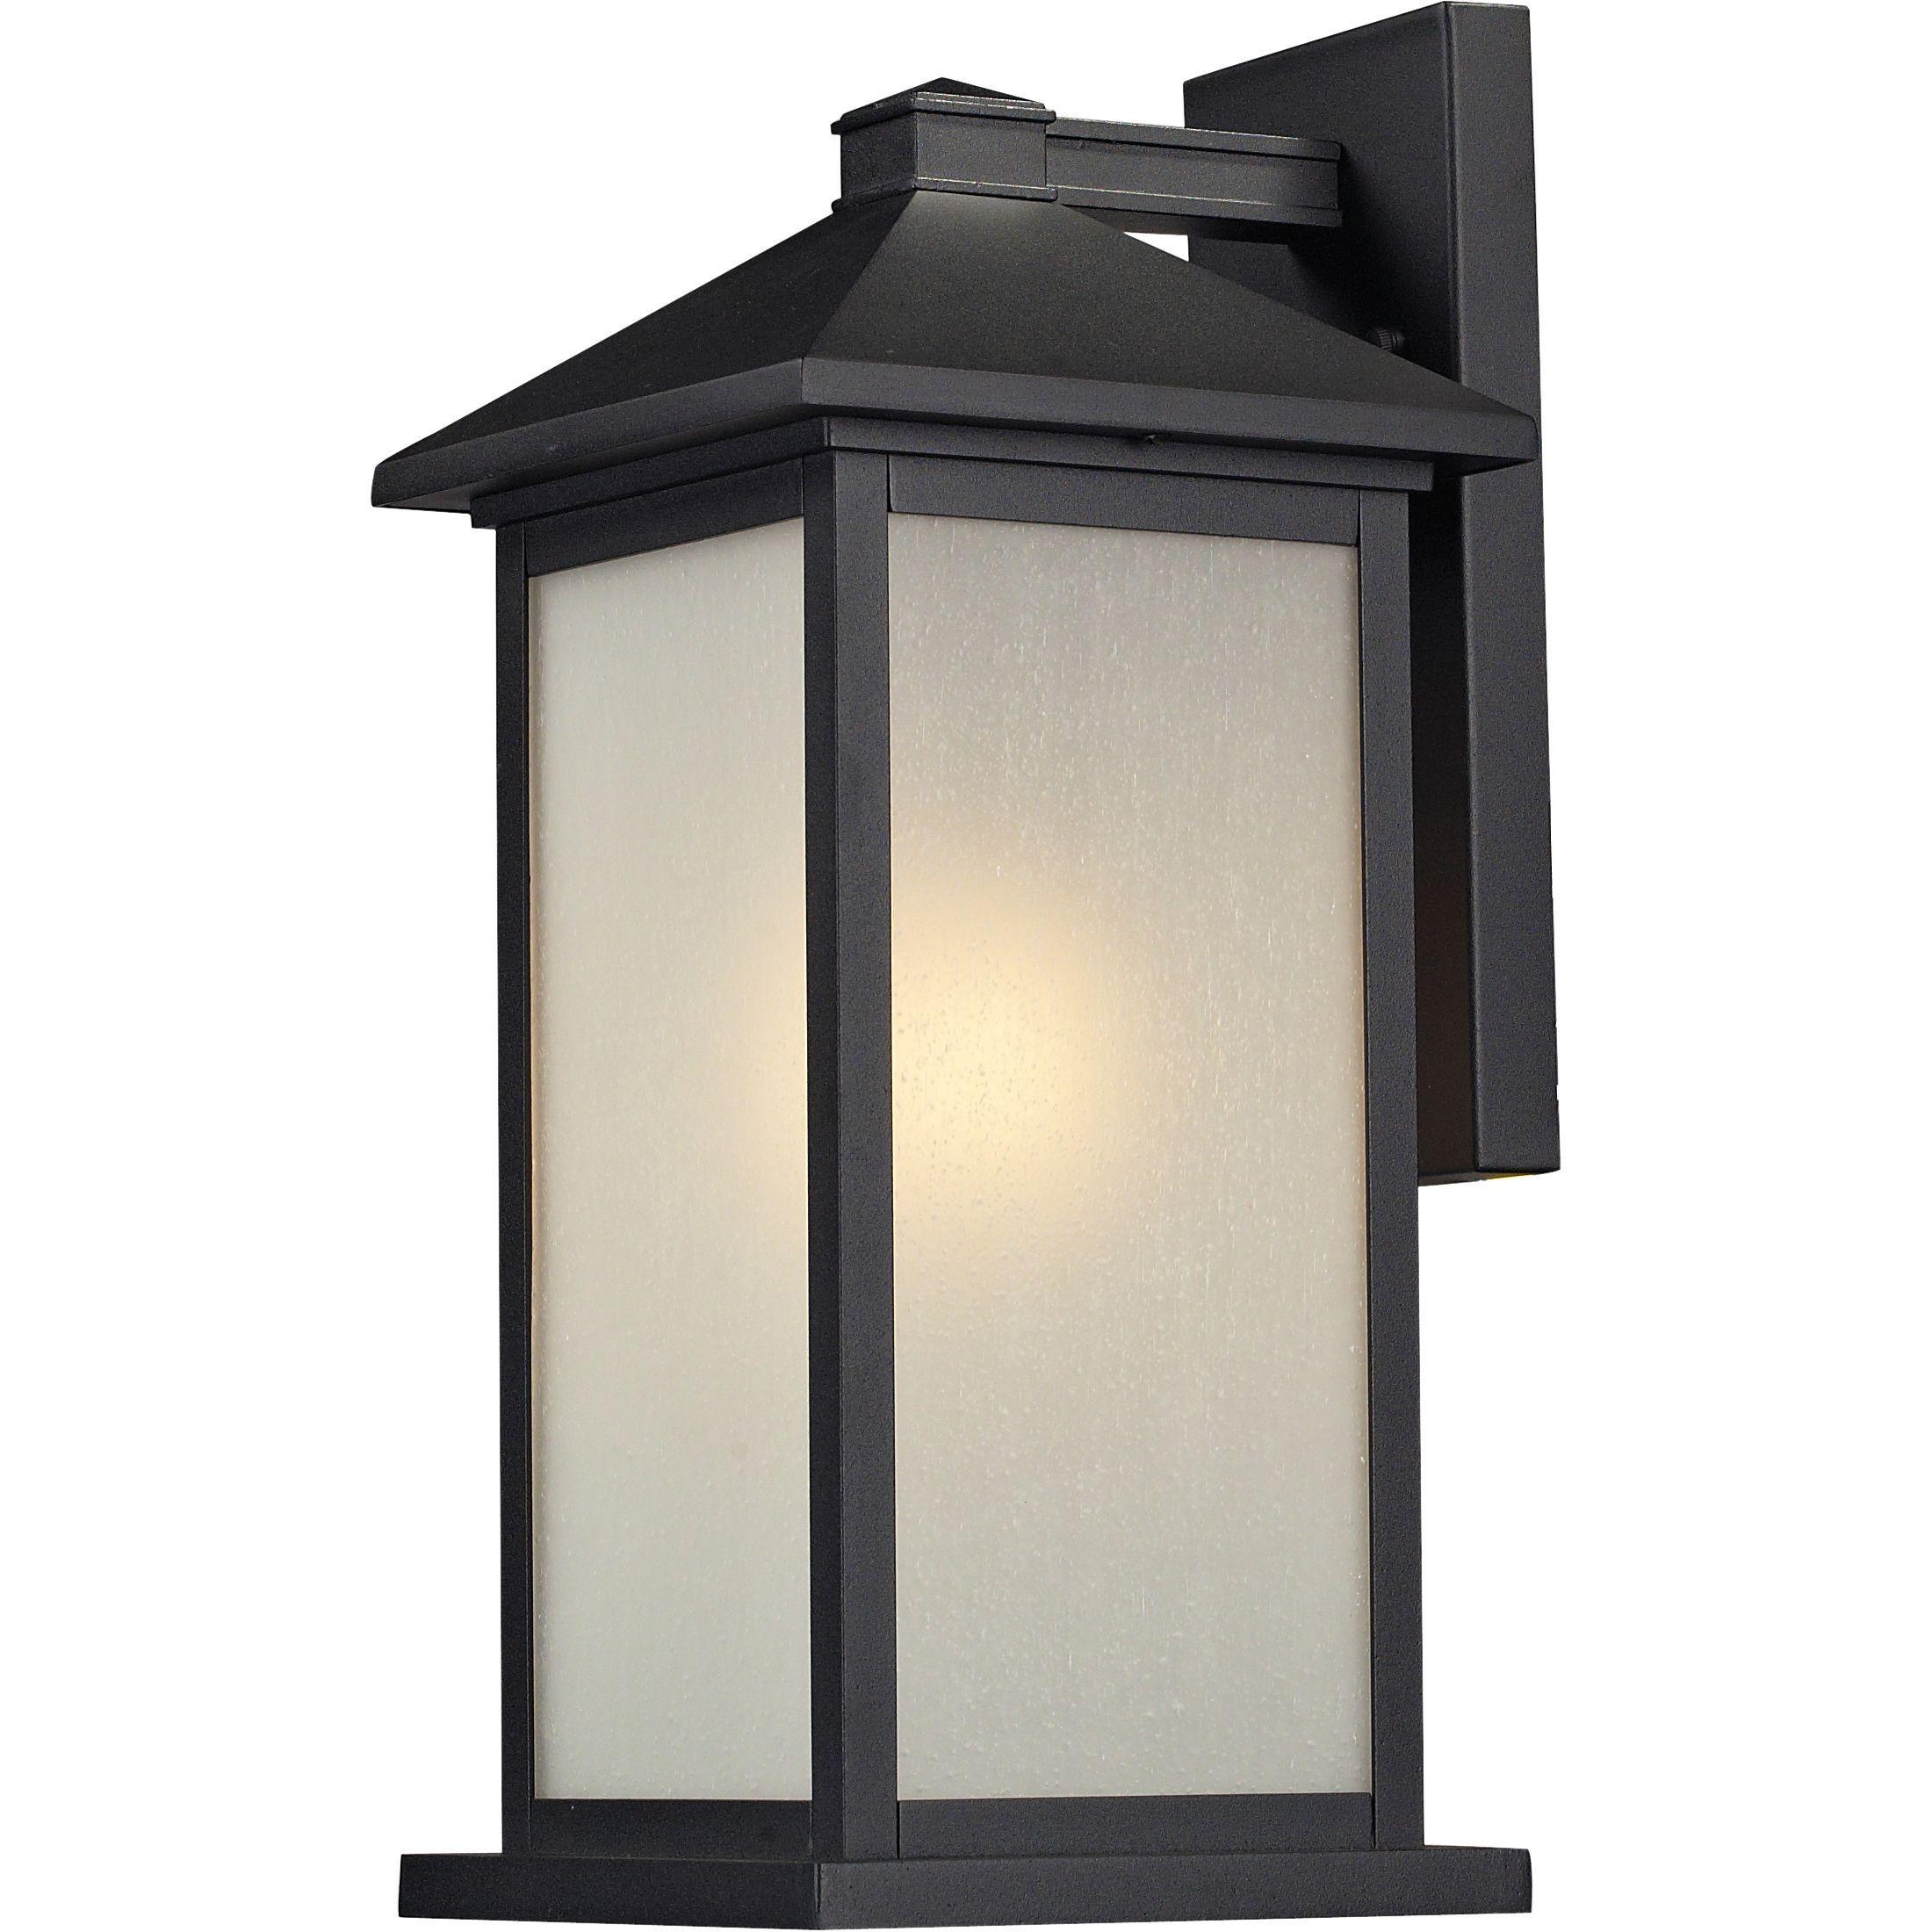 Outdoor Wall Mount Light Fixture